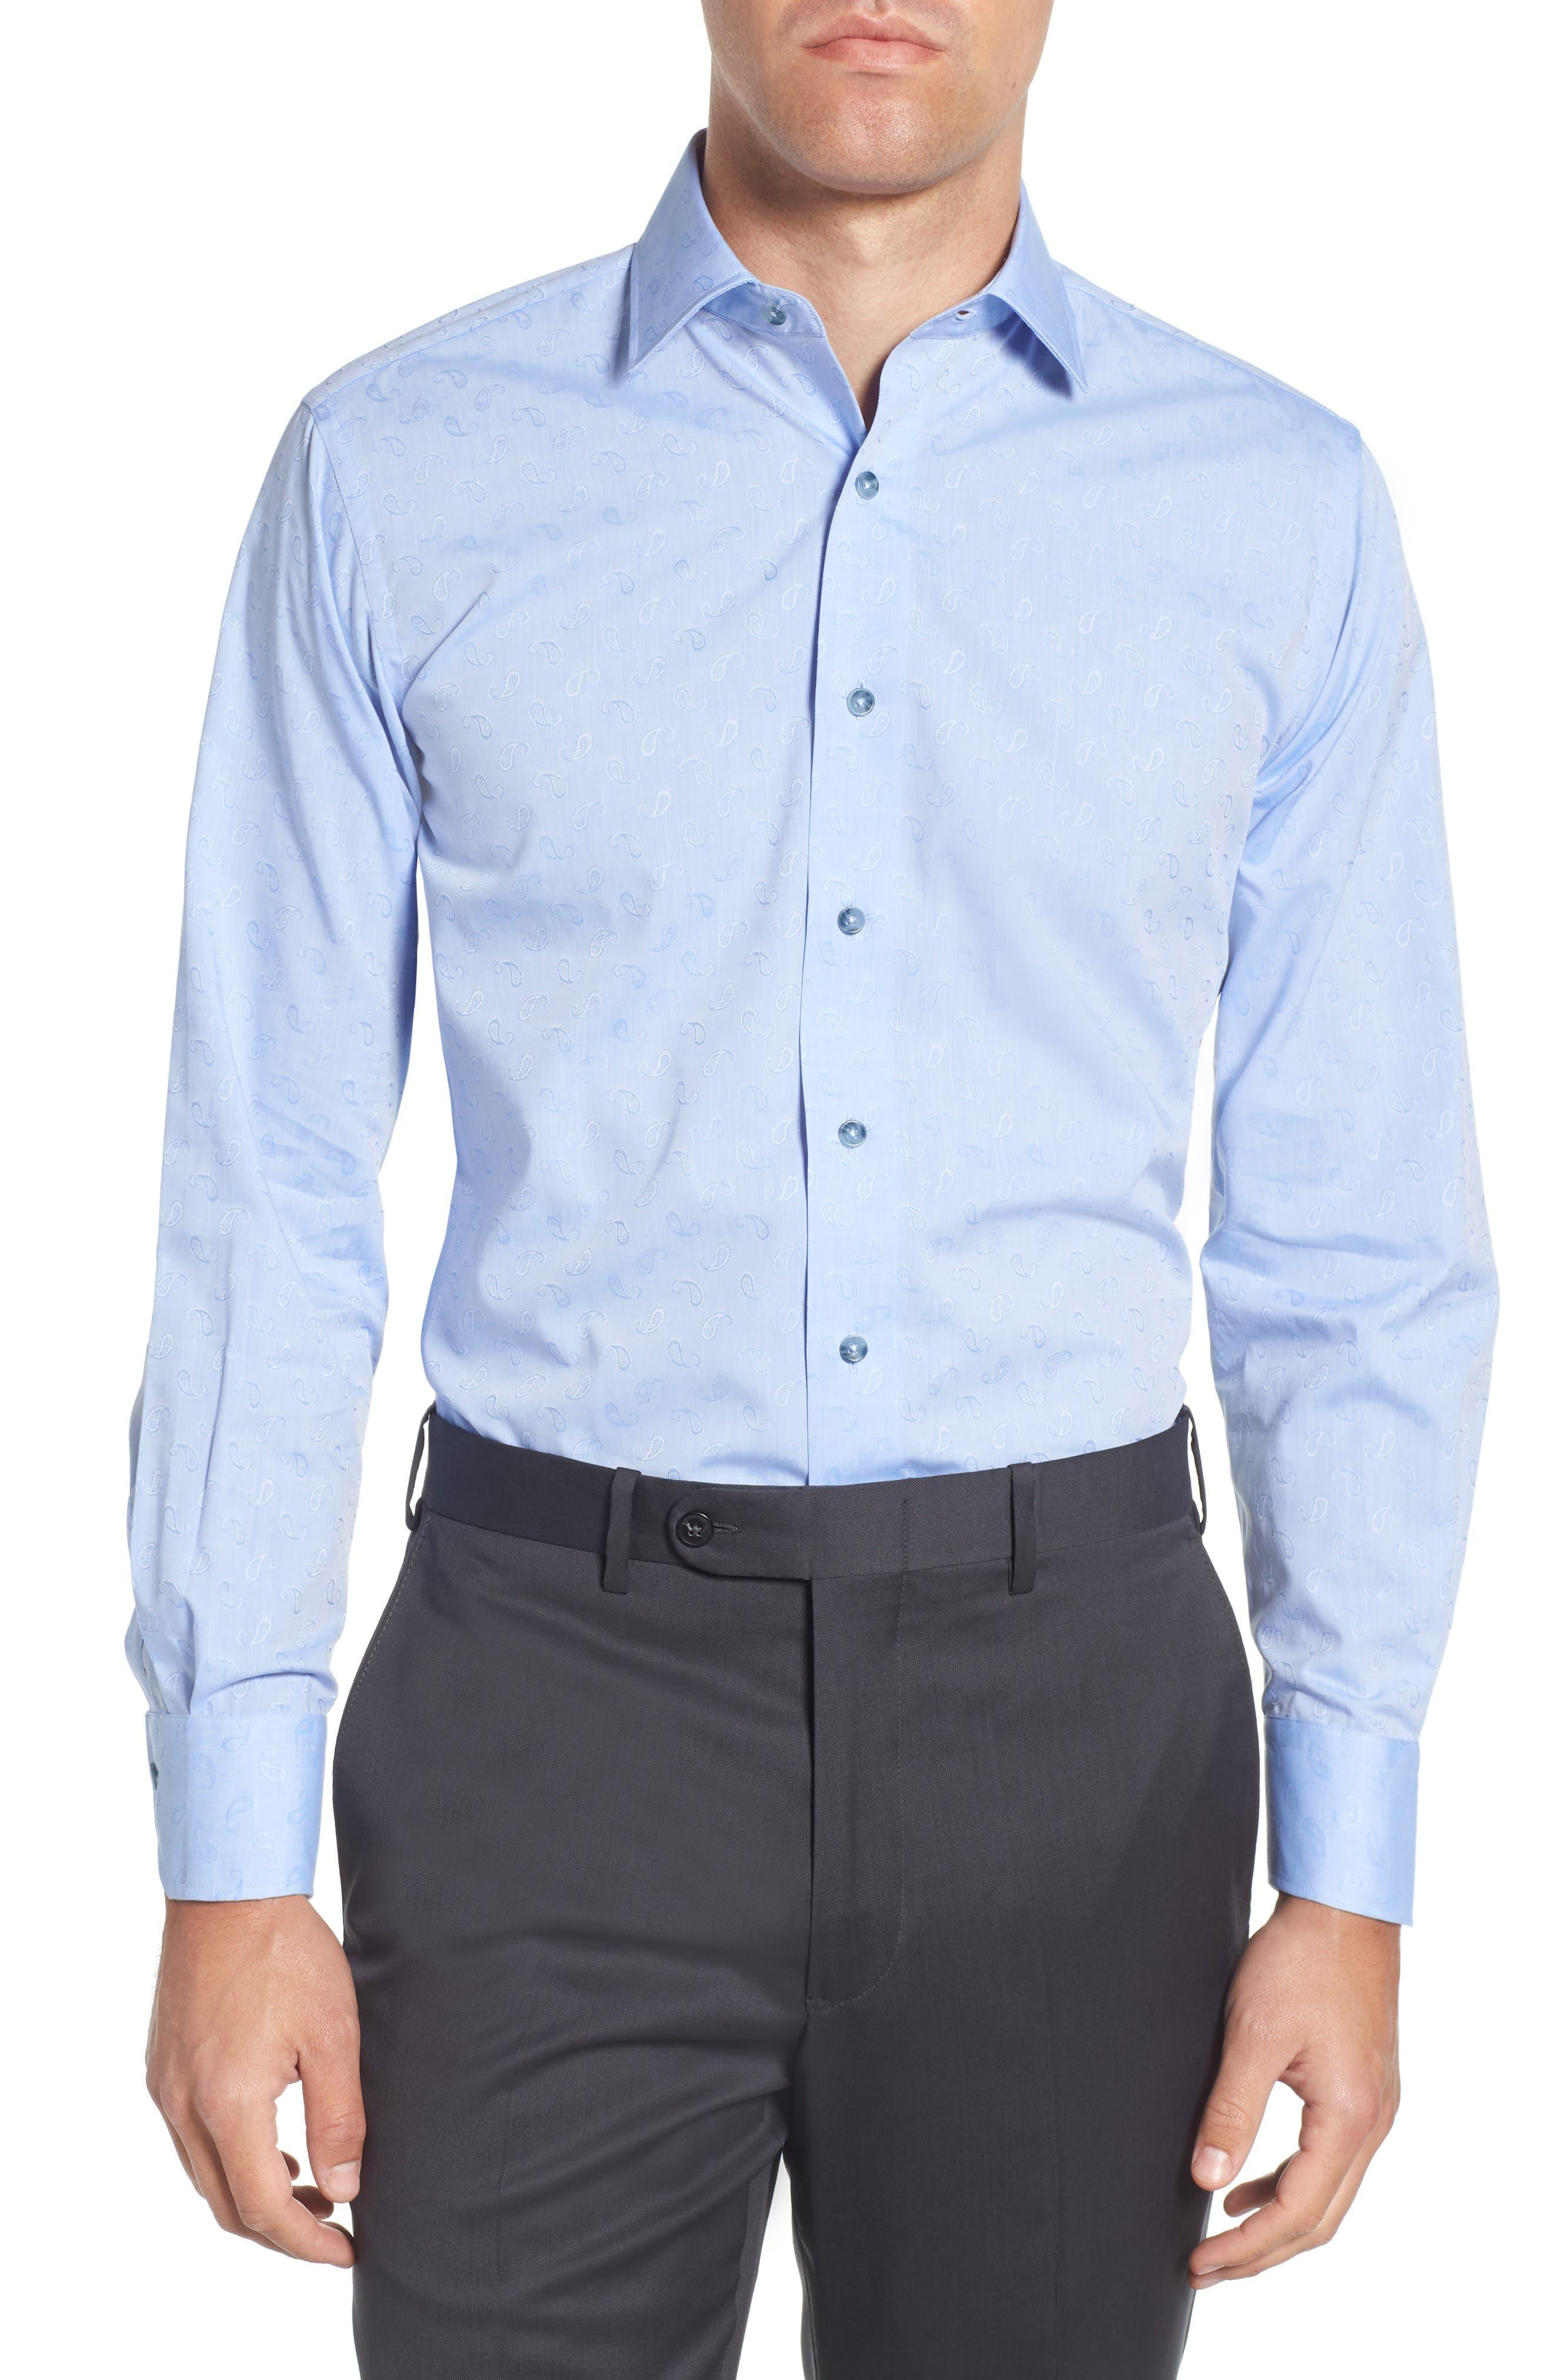 Trim Fit Paisley Dress Shirt,                             Main thumbnail 1, color,                             LIGHT BLUE